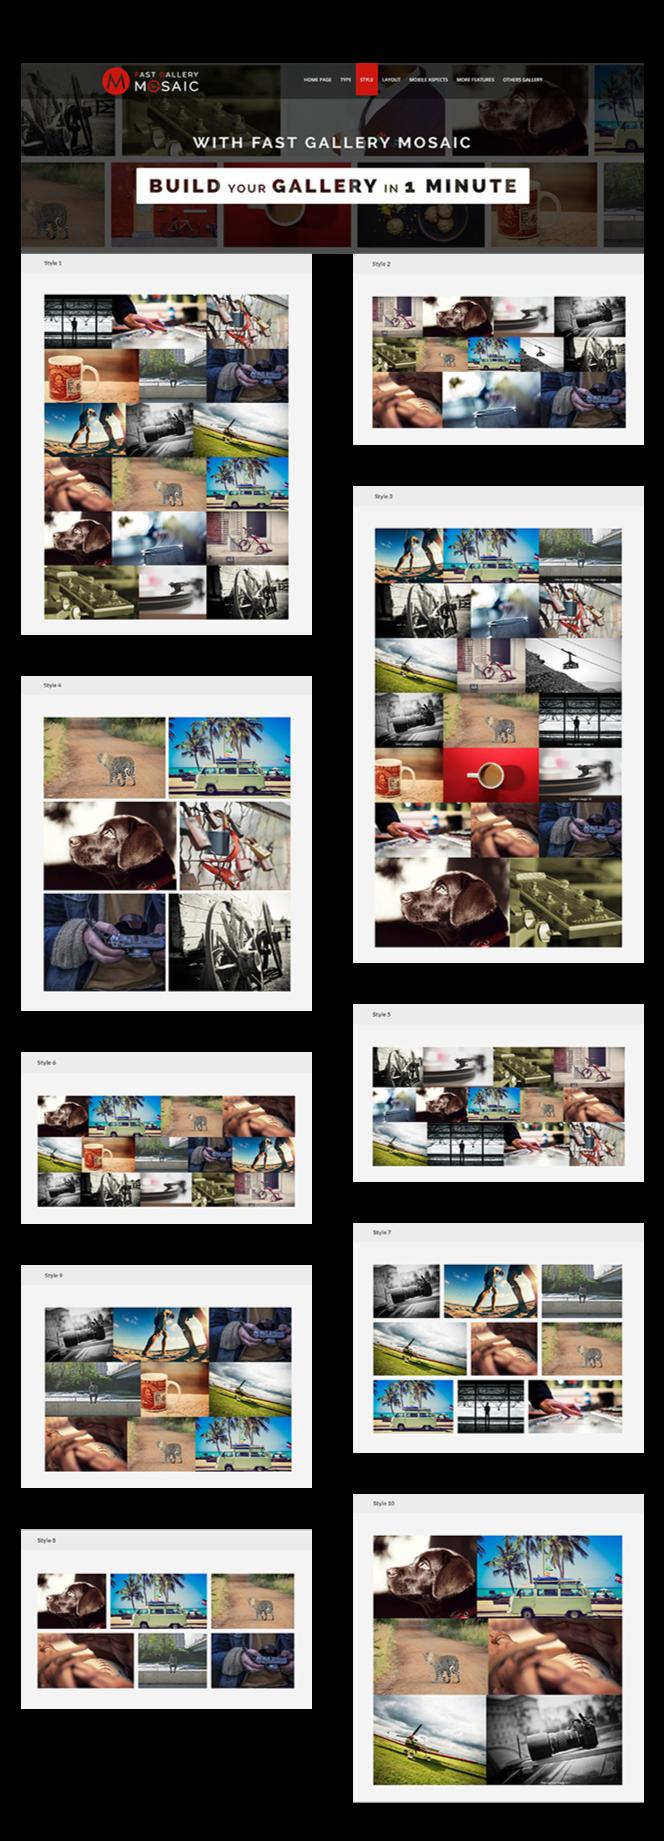 Fast Gallery Mosaic - WordPress Plugin - 3